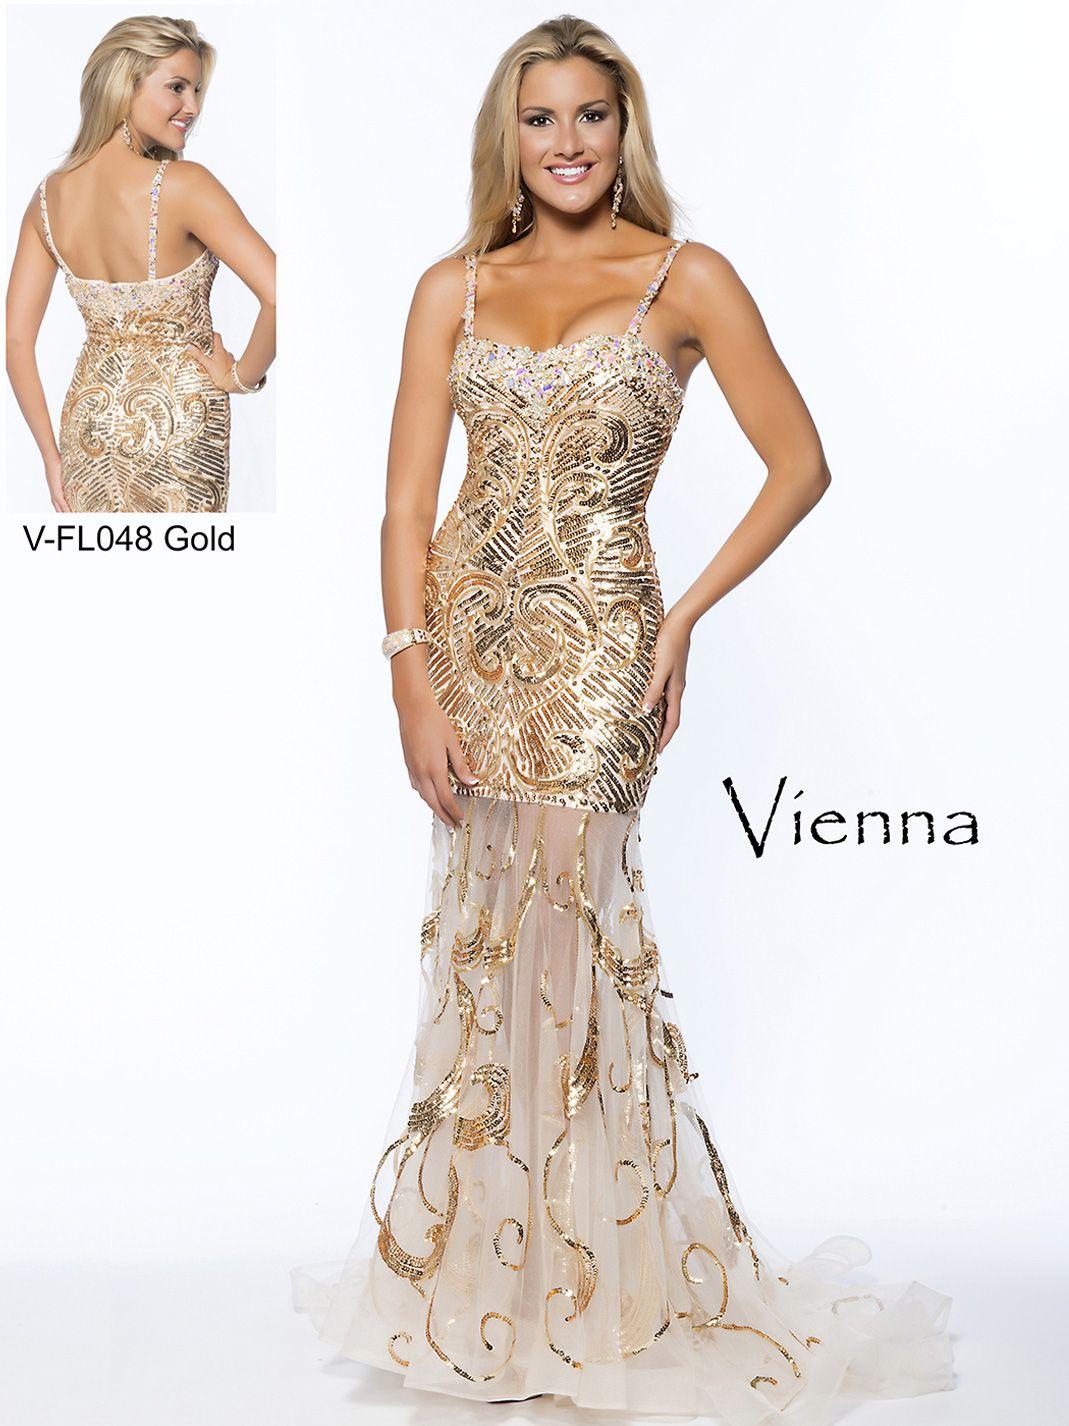 Sweetheart Beaded Top Formal Prom Dress Vienna Fl048 Prom Dresses Pageant Dresses Formal Dresses Prom [ 1426 x 1069 Pixel ]